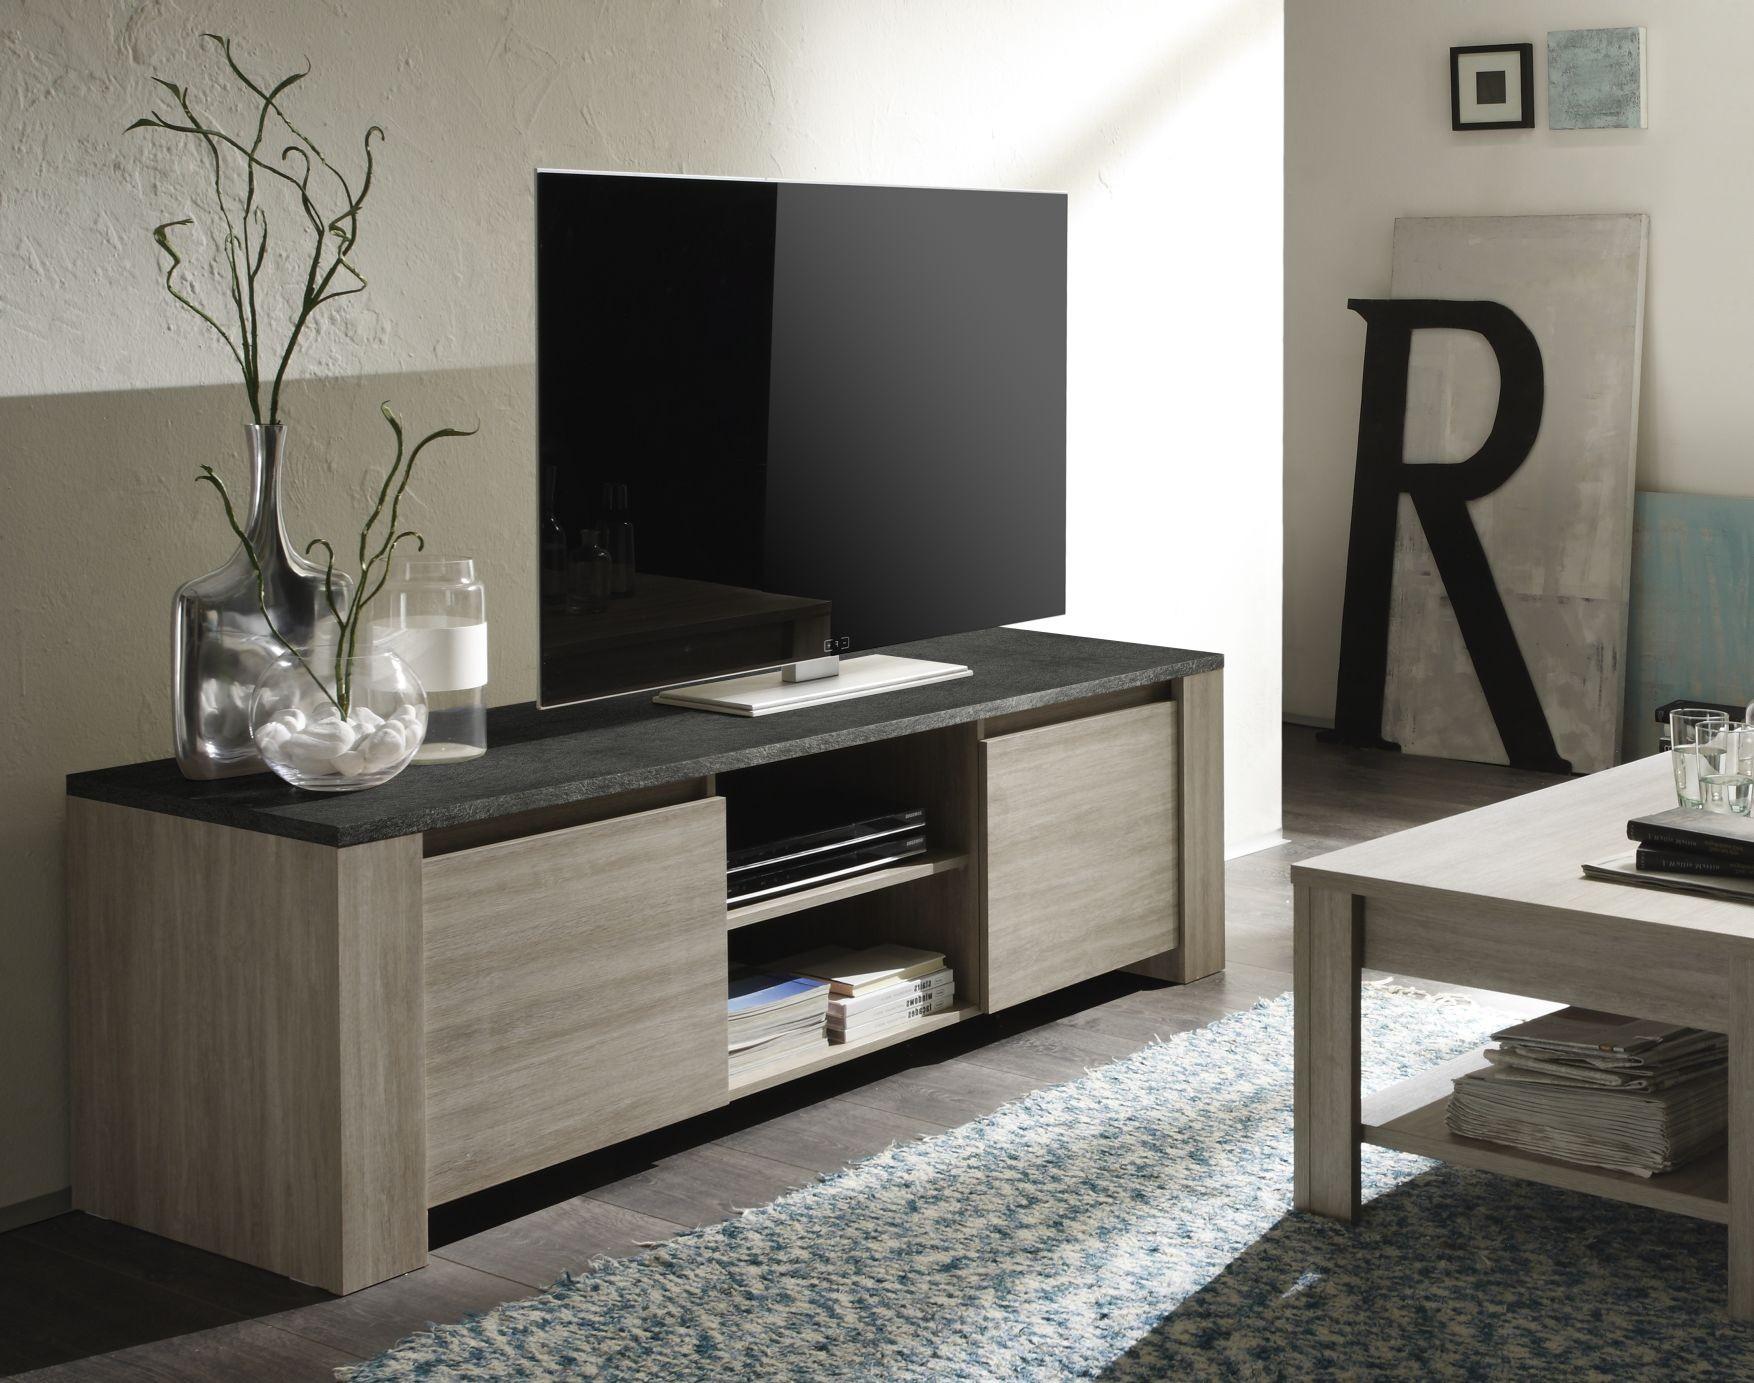 Meubles Salle à Manger but Meilleur De Galerie Meuble Tele but 22 Awesome Stunning Table Tv Contemporary